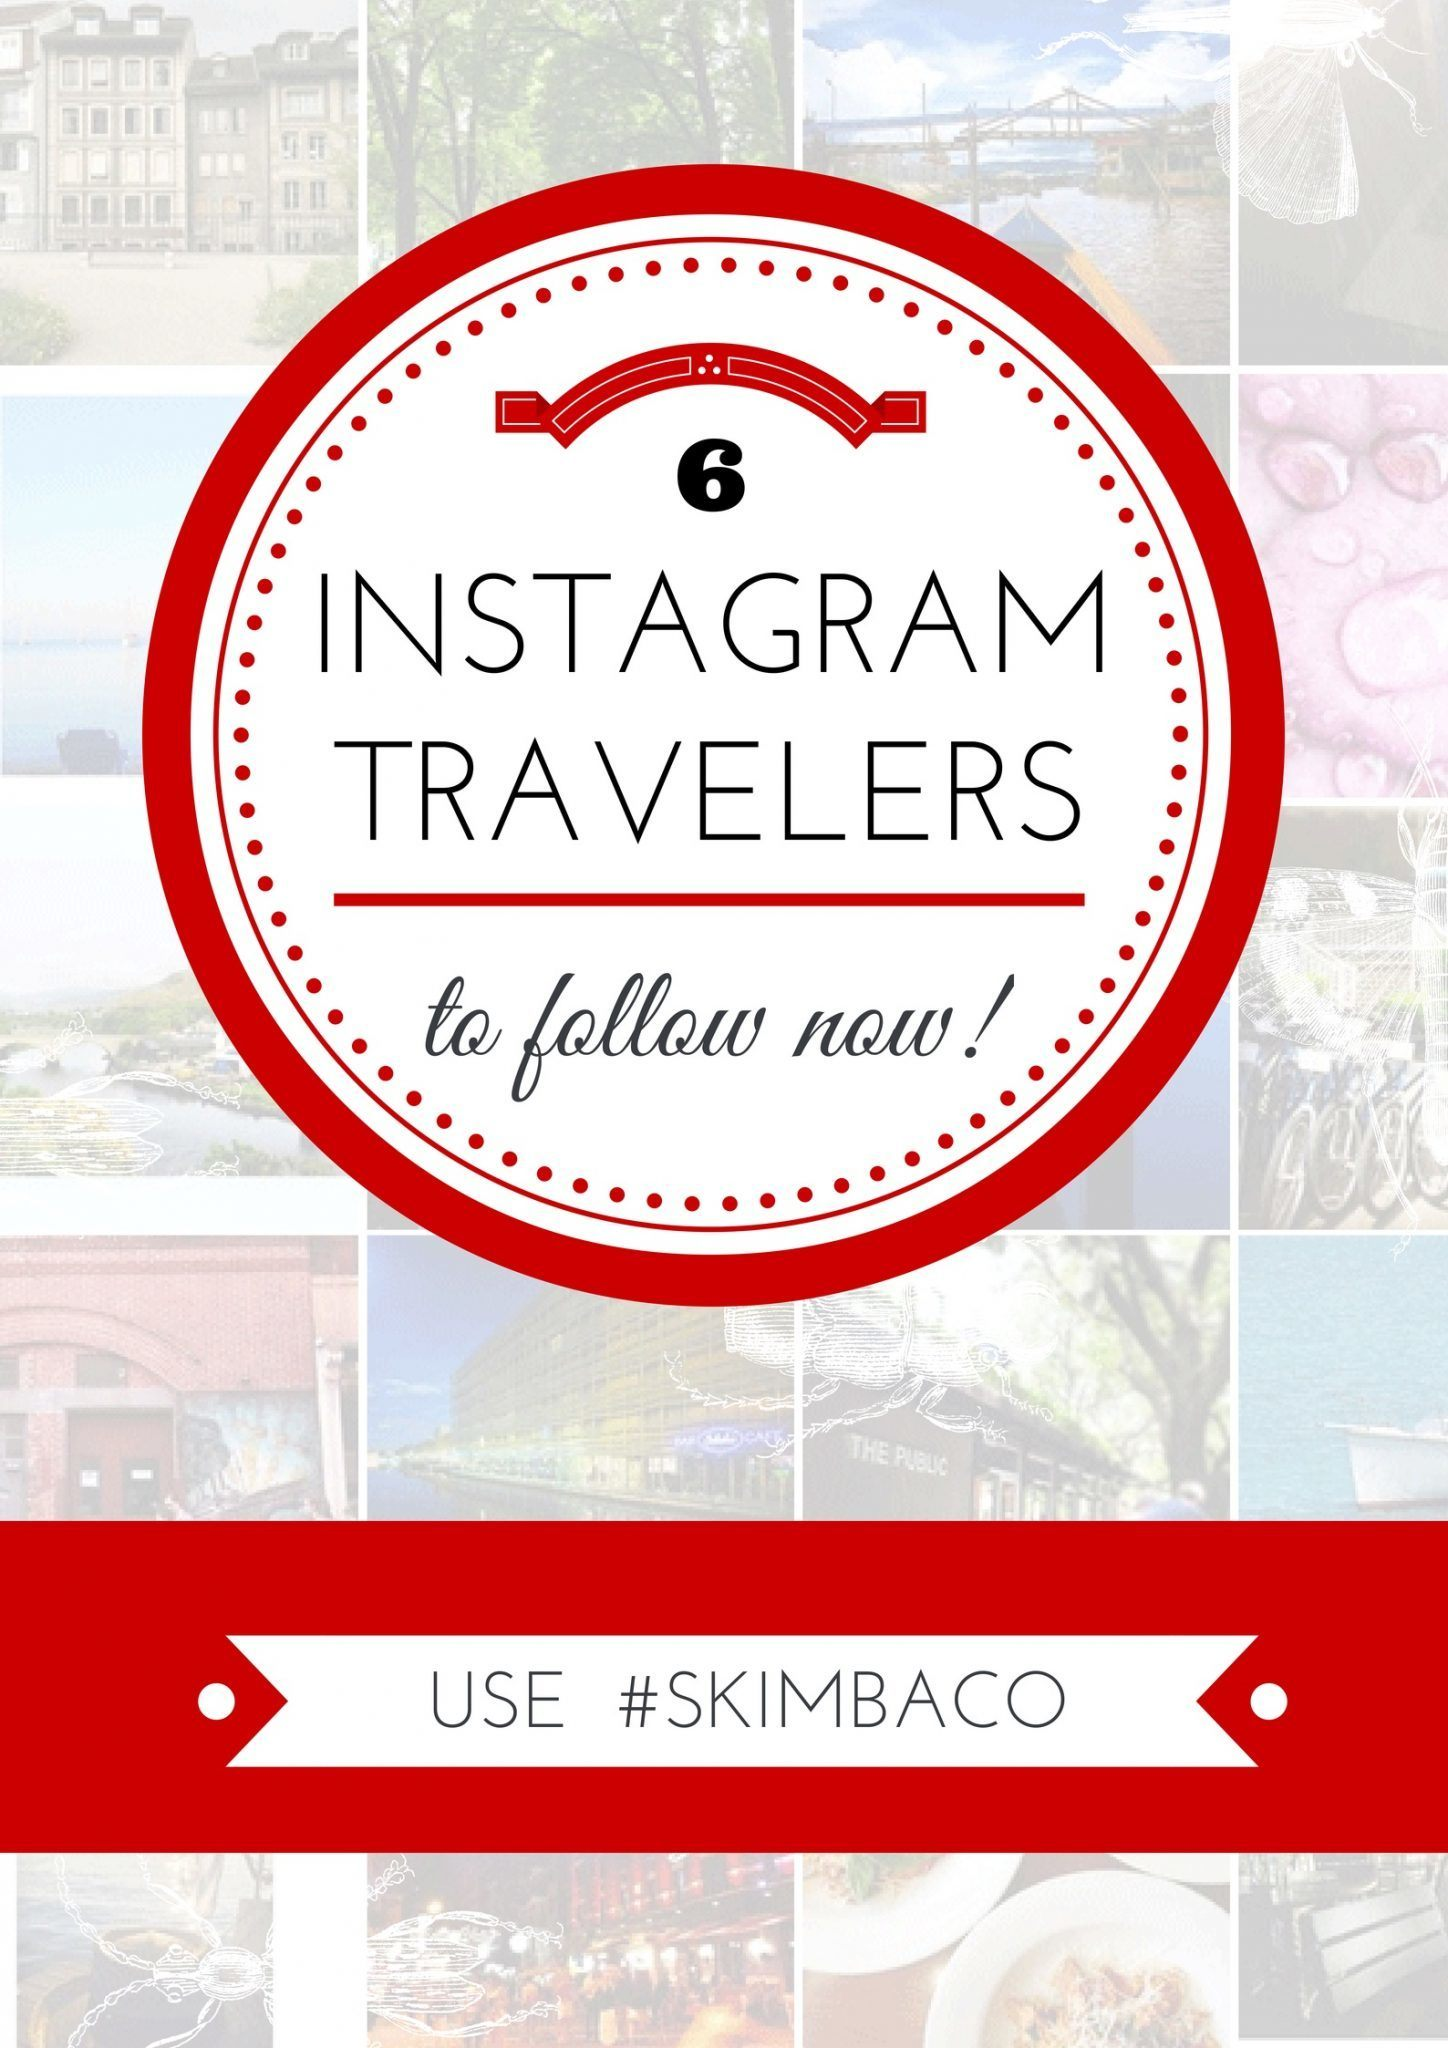 6 amazing travel accounts to follow on Instagram